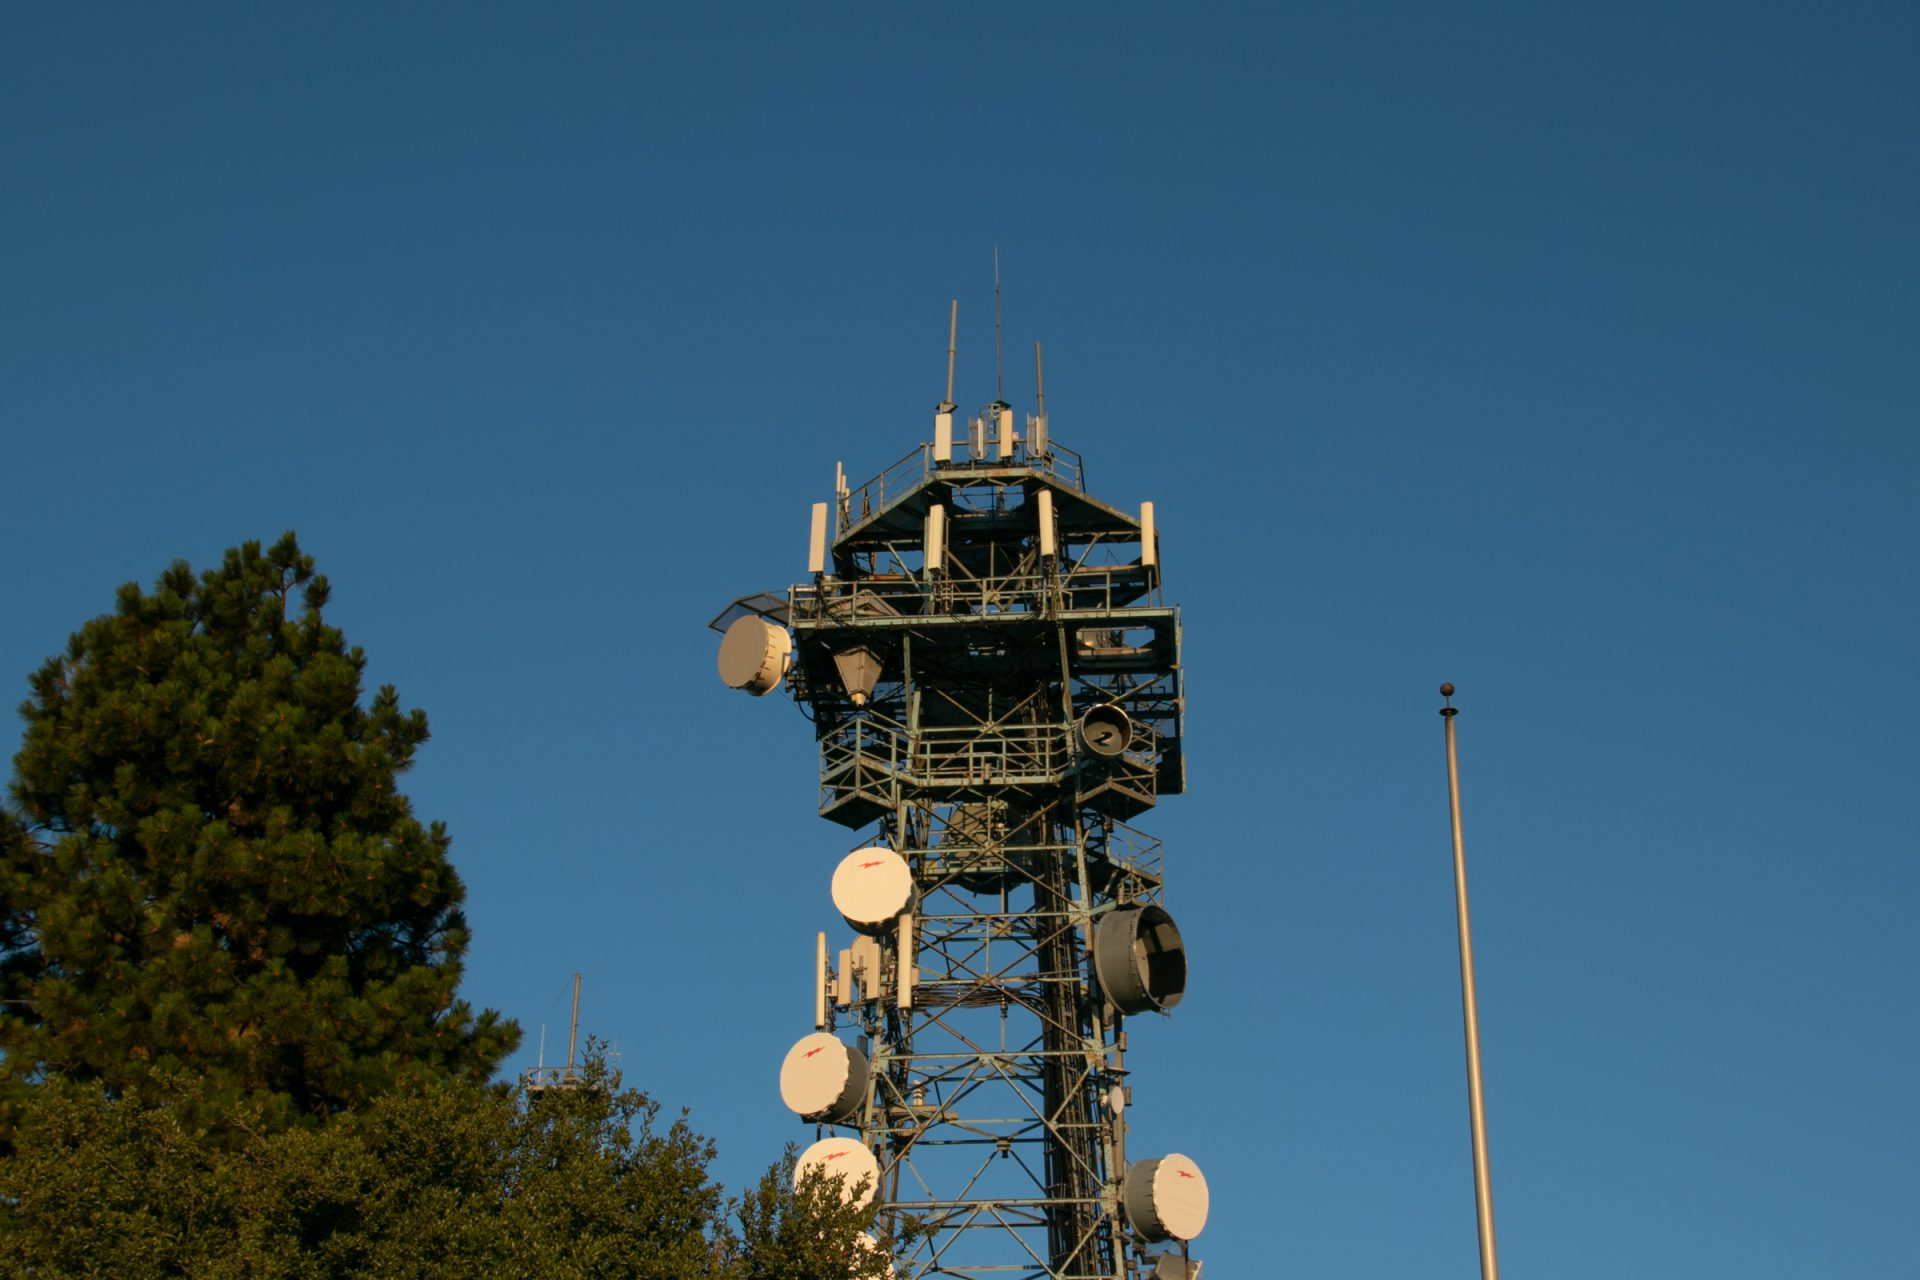 Top Of Radio Tower Next To Tree